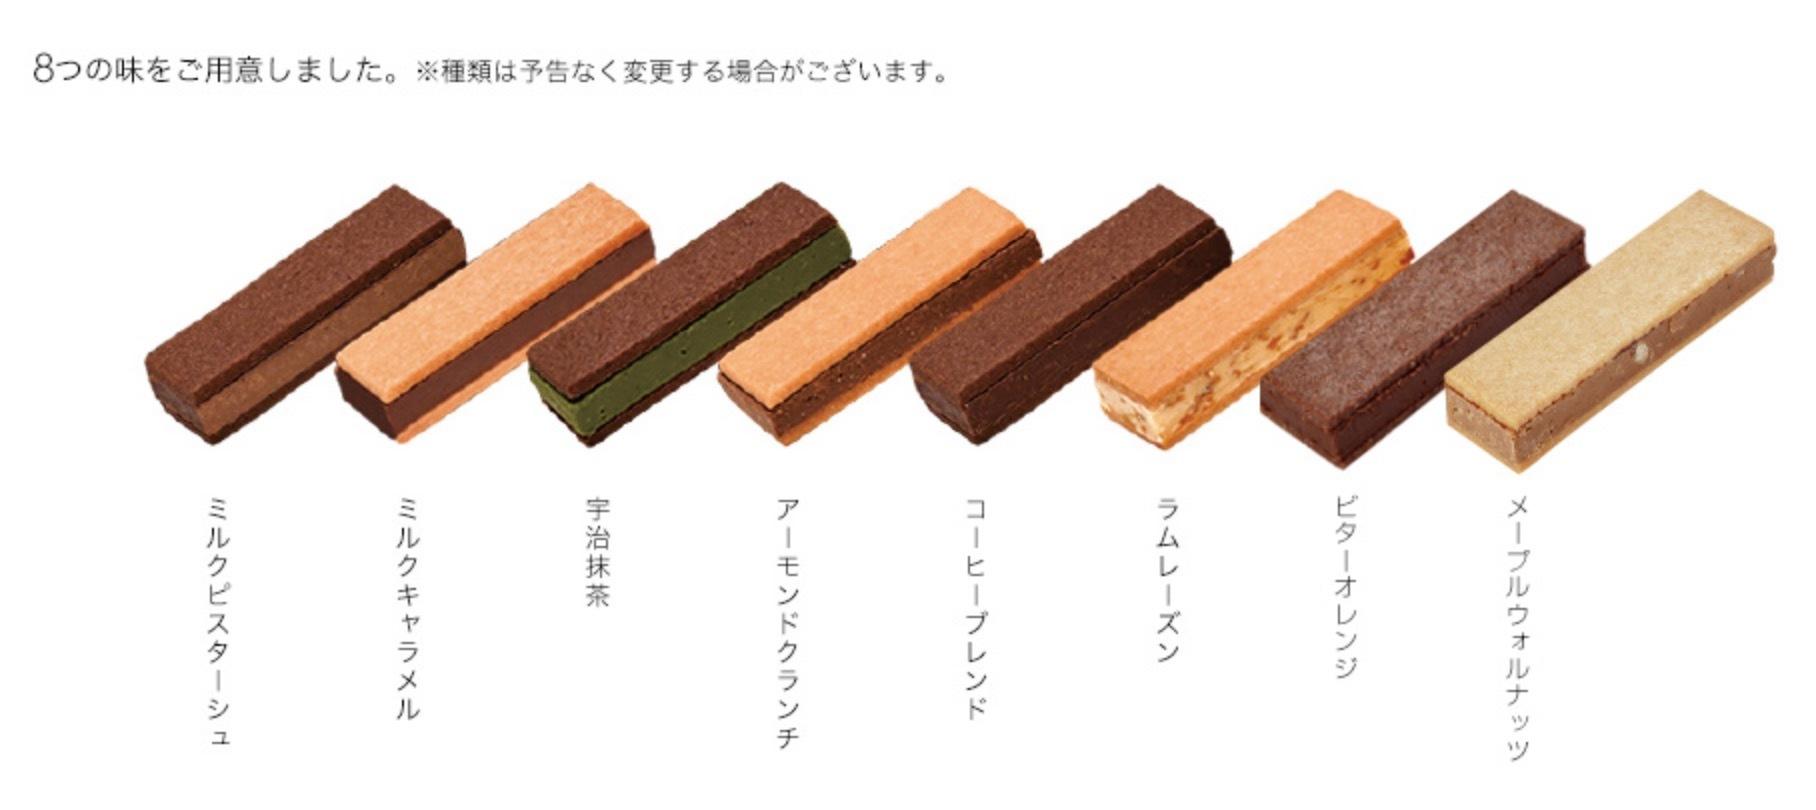 Magie du chocolat(マジドショコラ)@自由が丘 優雅なチョコレート屋さんでホワイトデーお返しと自分用ご褒美!_b0024832_00164216.jpg